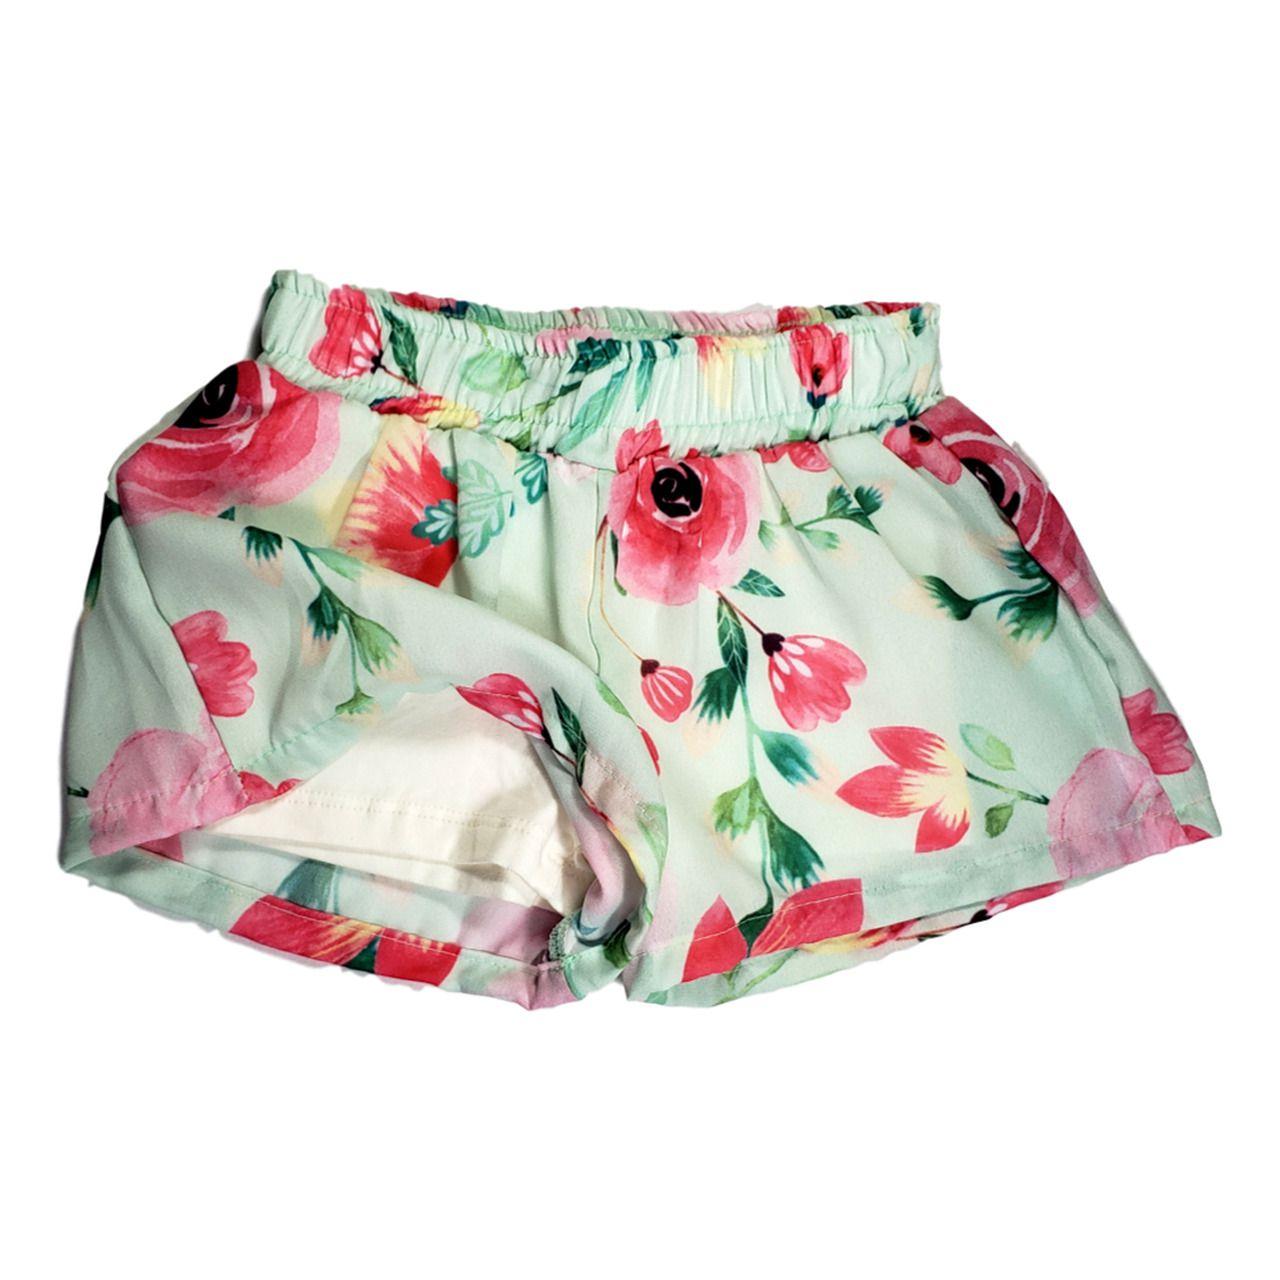 Conjunto Infantil Menina Bata Jeans Claro com Shorts Estampado